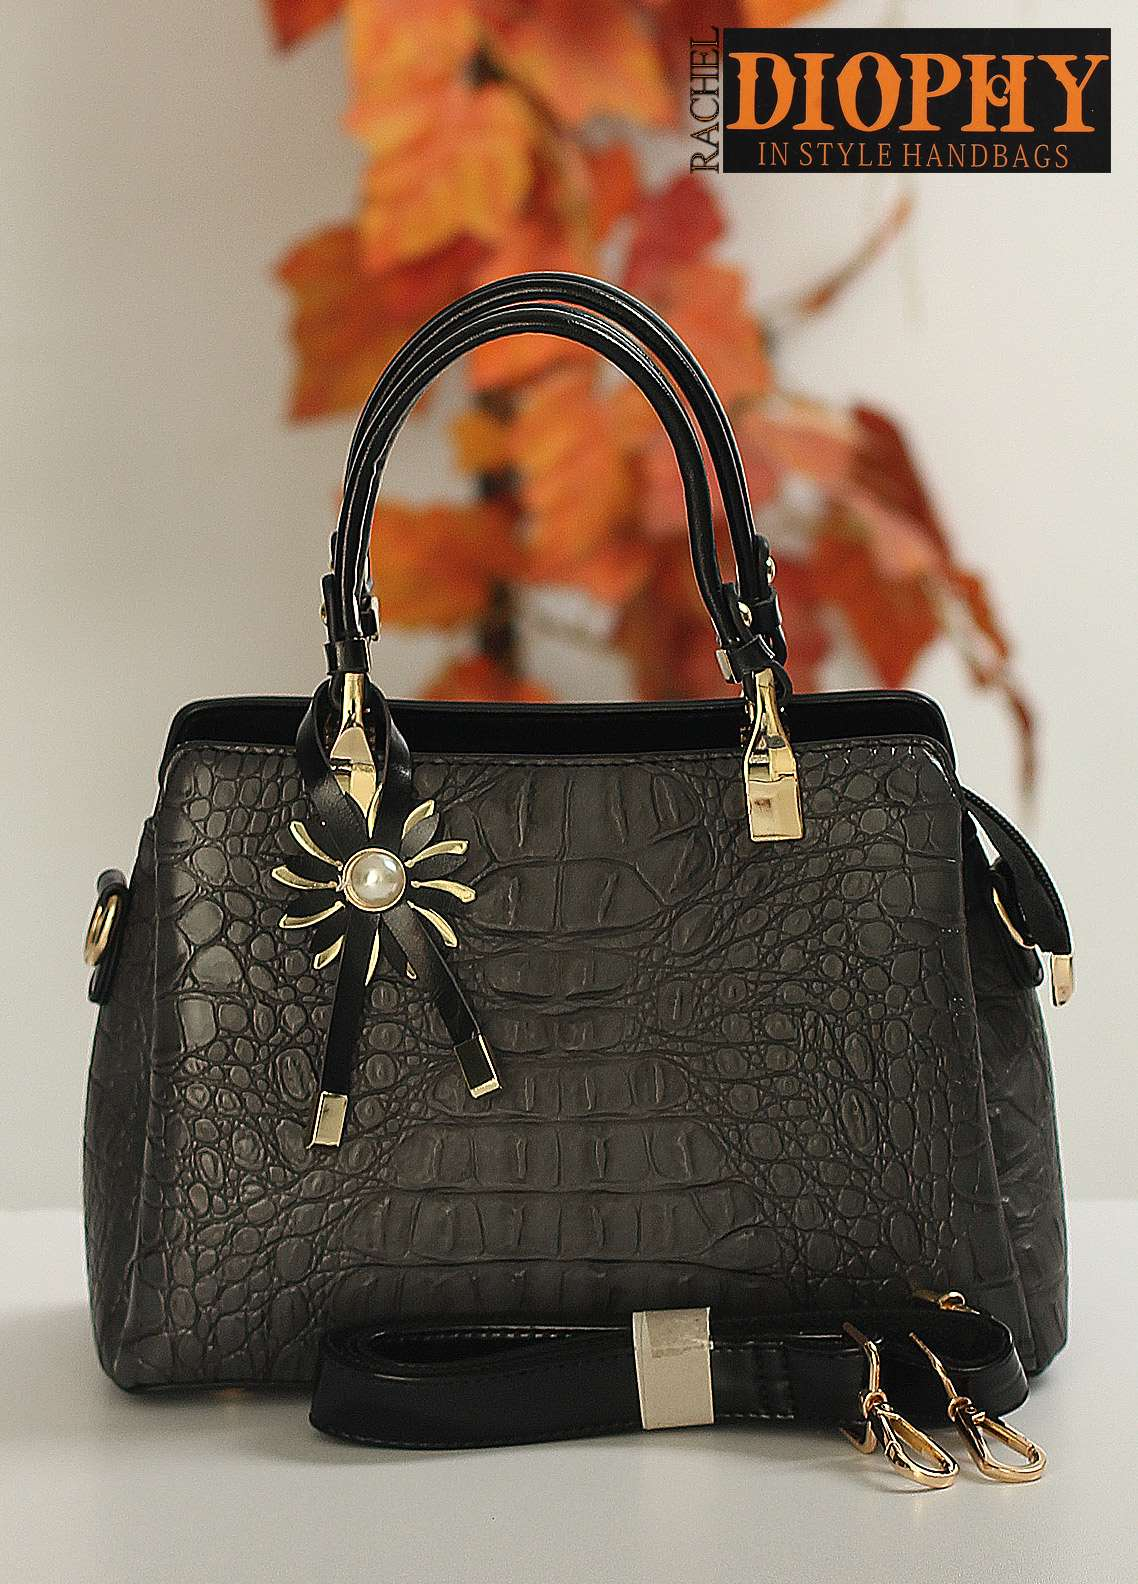 Rachel Diophy PU Leather Satchels Handbags for Women - Grey with Crocodile Textured